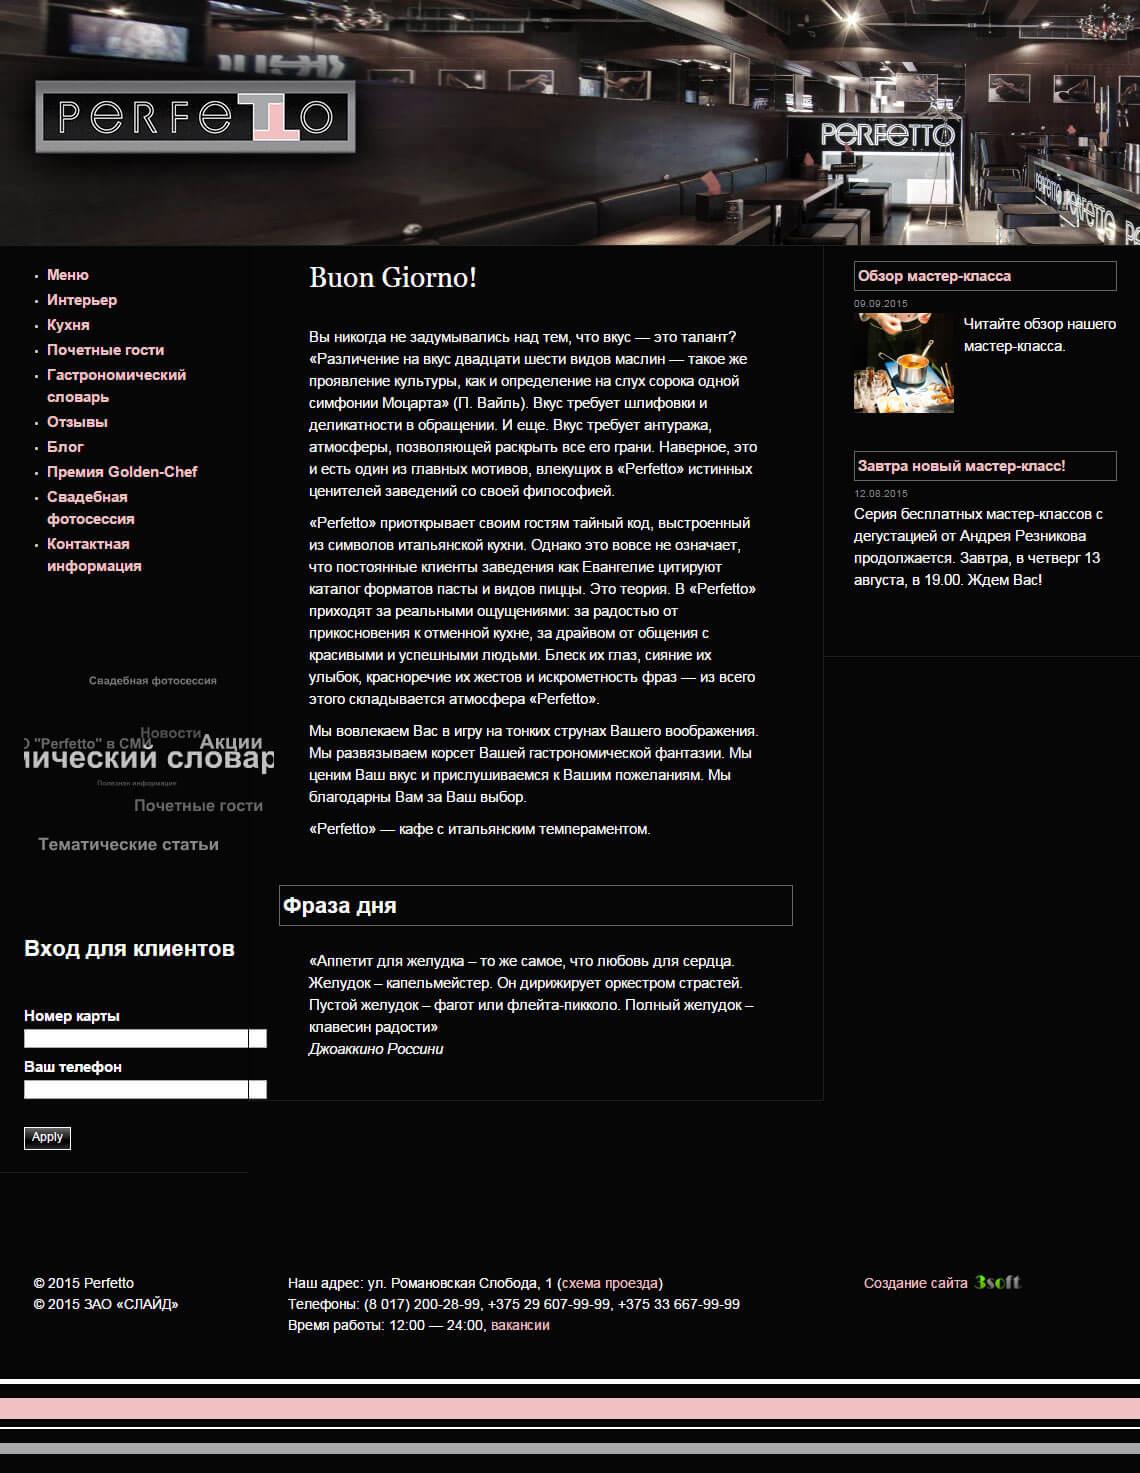 Сайт ресторана «Perfetto». Главная страница.